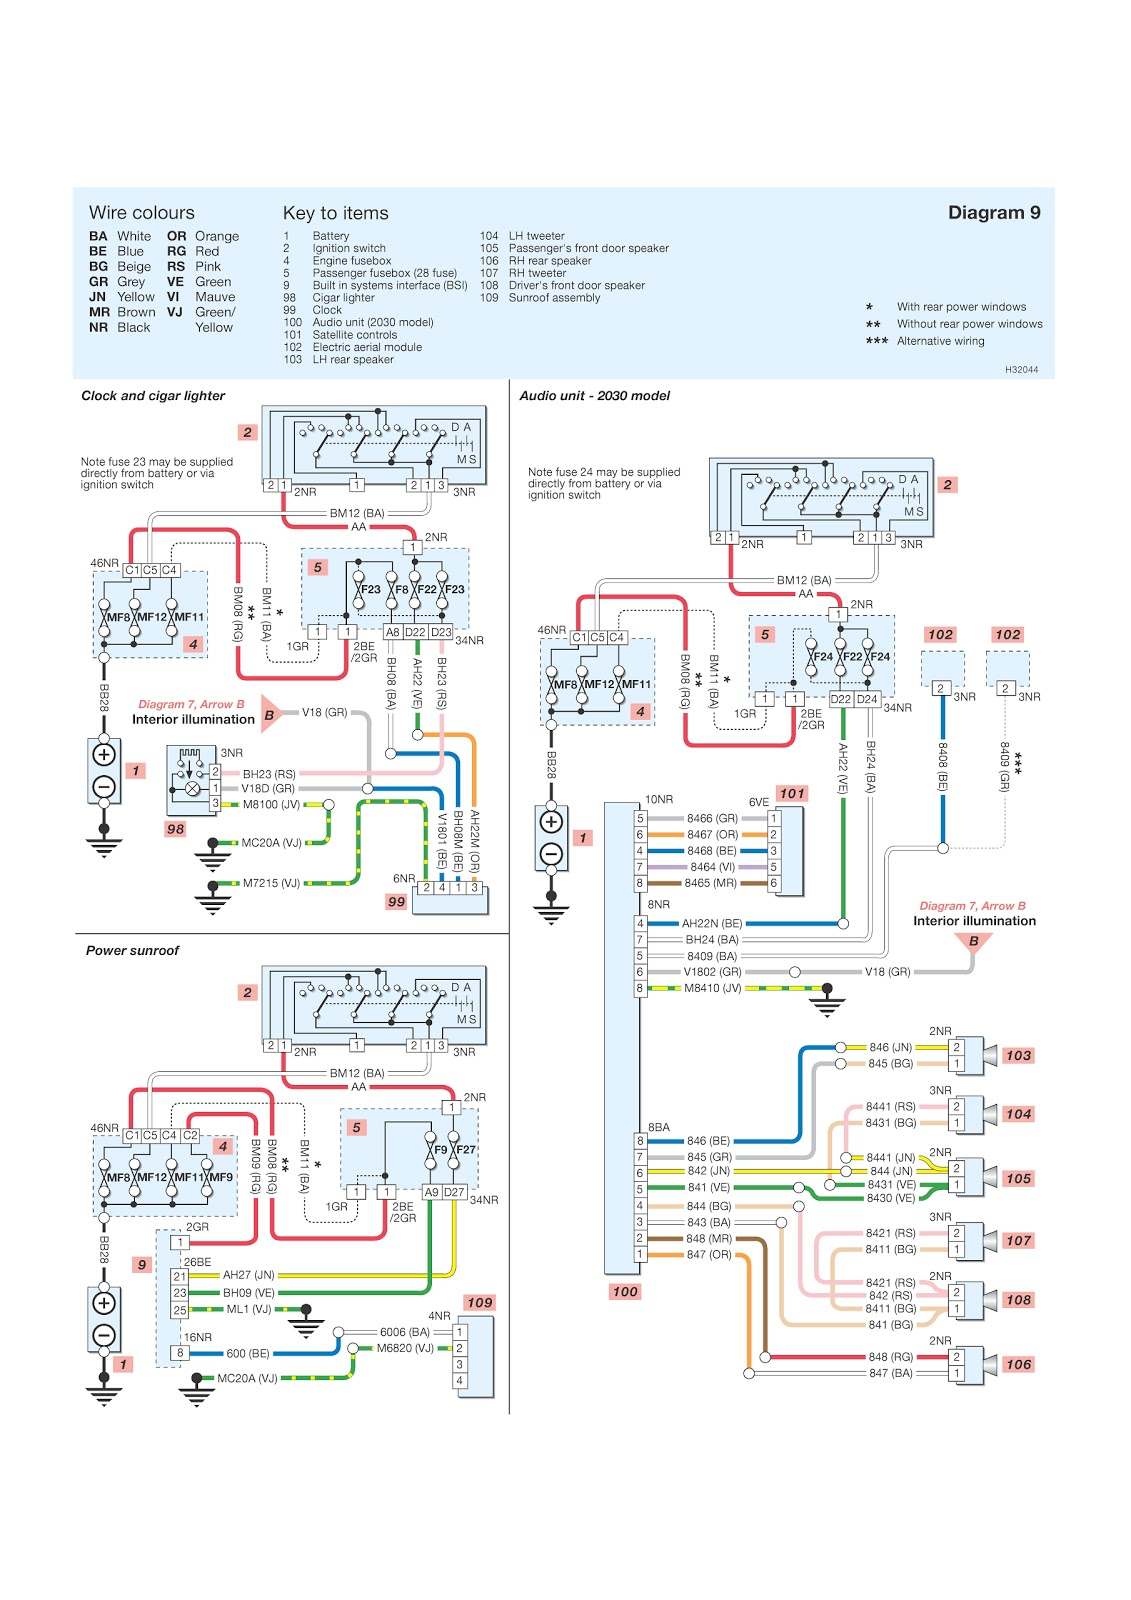 peugeot 206 multiplex wiring diagram wiring diagram database peugeot 206 wiring diagram 11 [ 1131 x 1600 Pixel ]